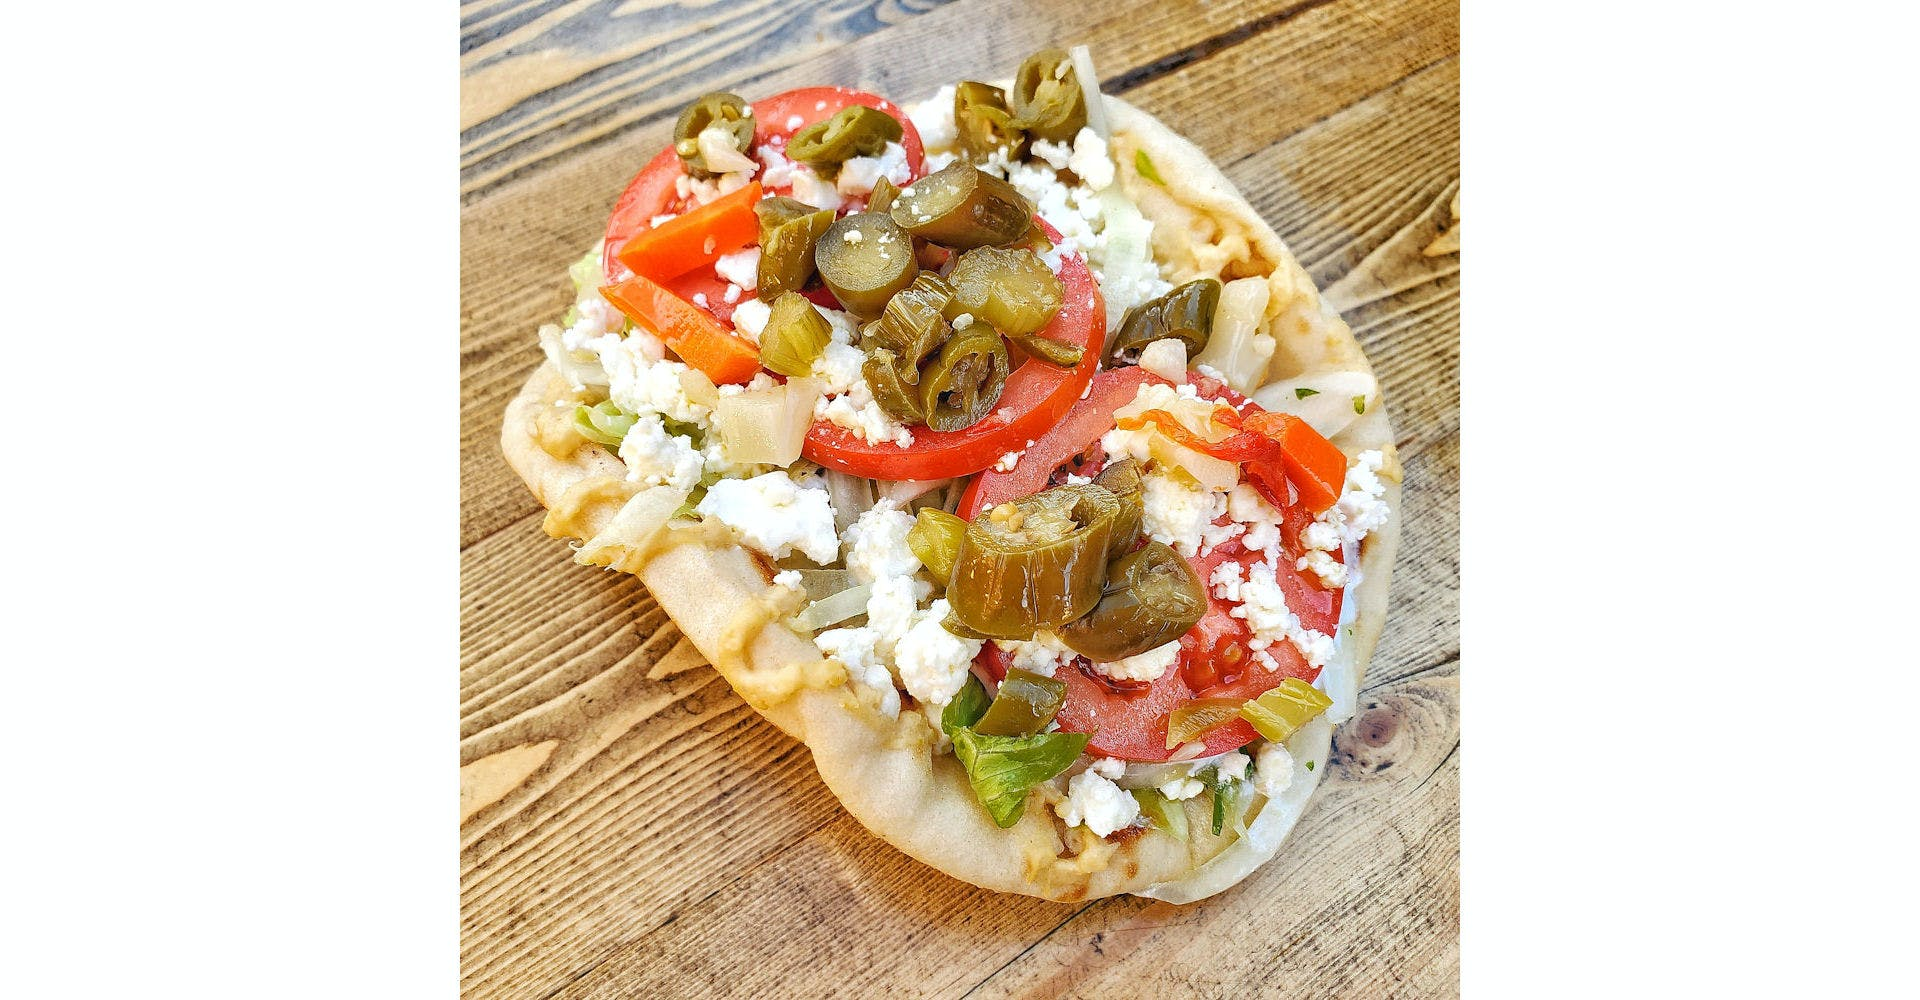 Spicy Veggie Sandwich from Parthenon Gyros in Madison, WI